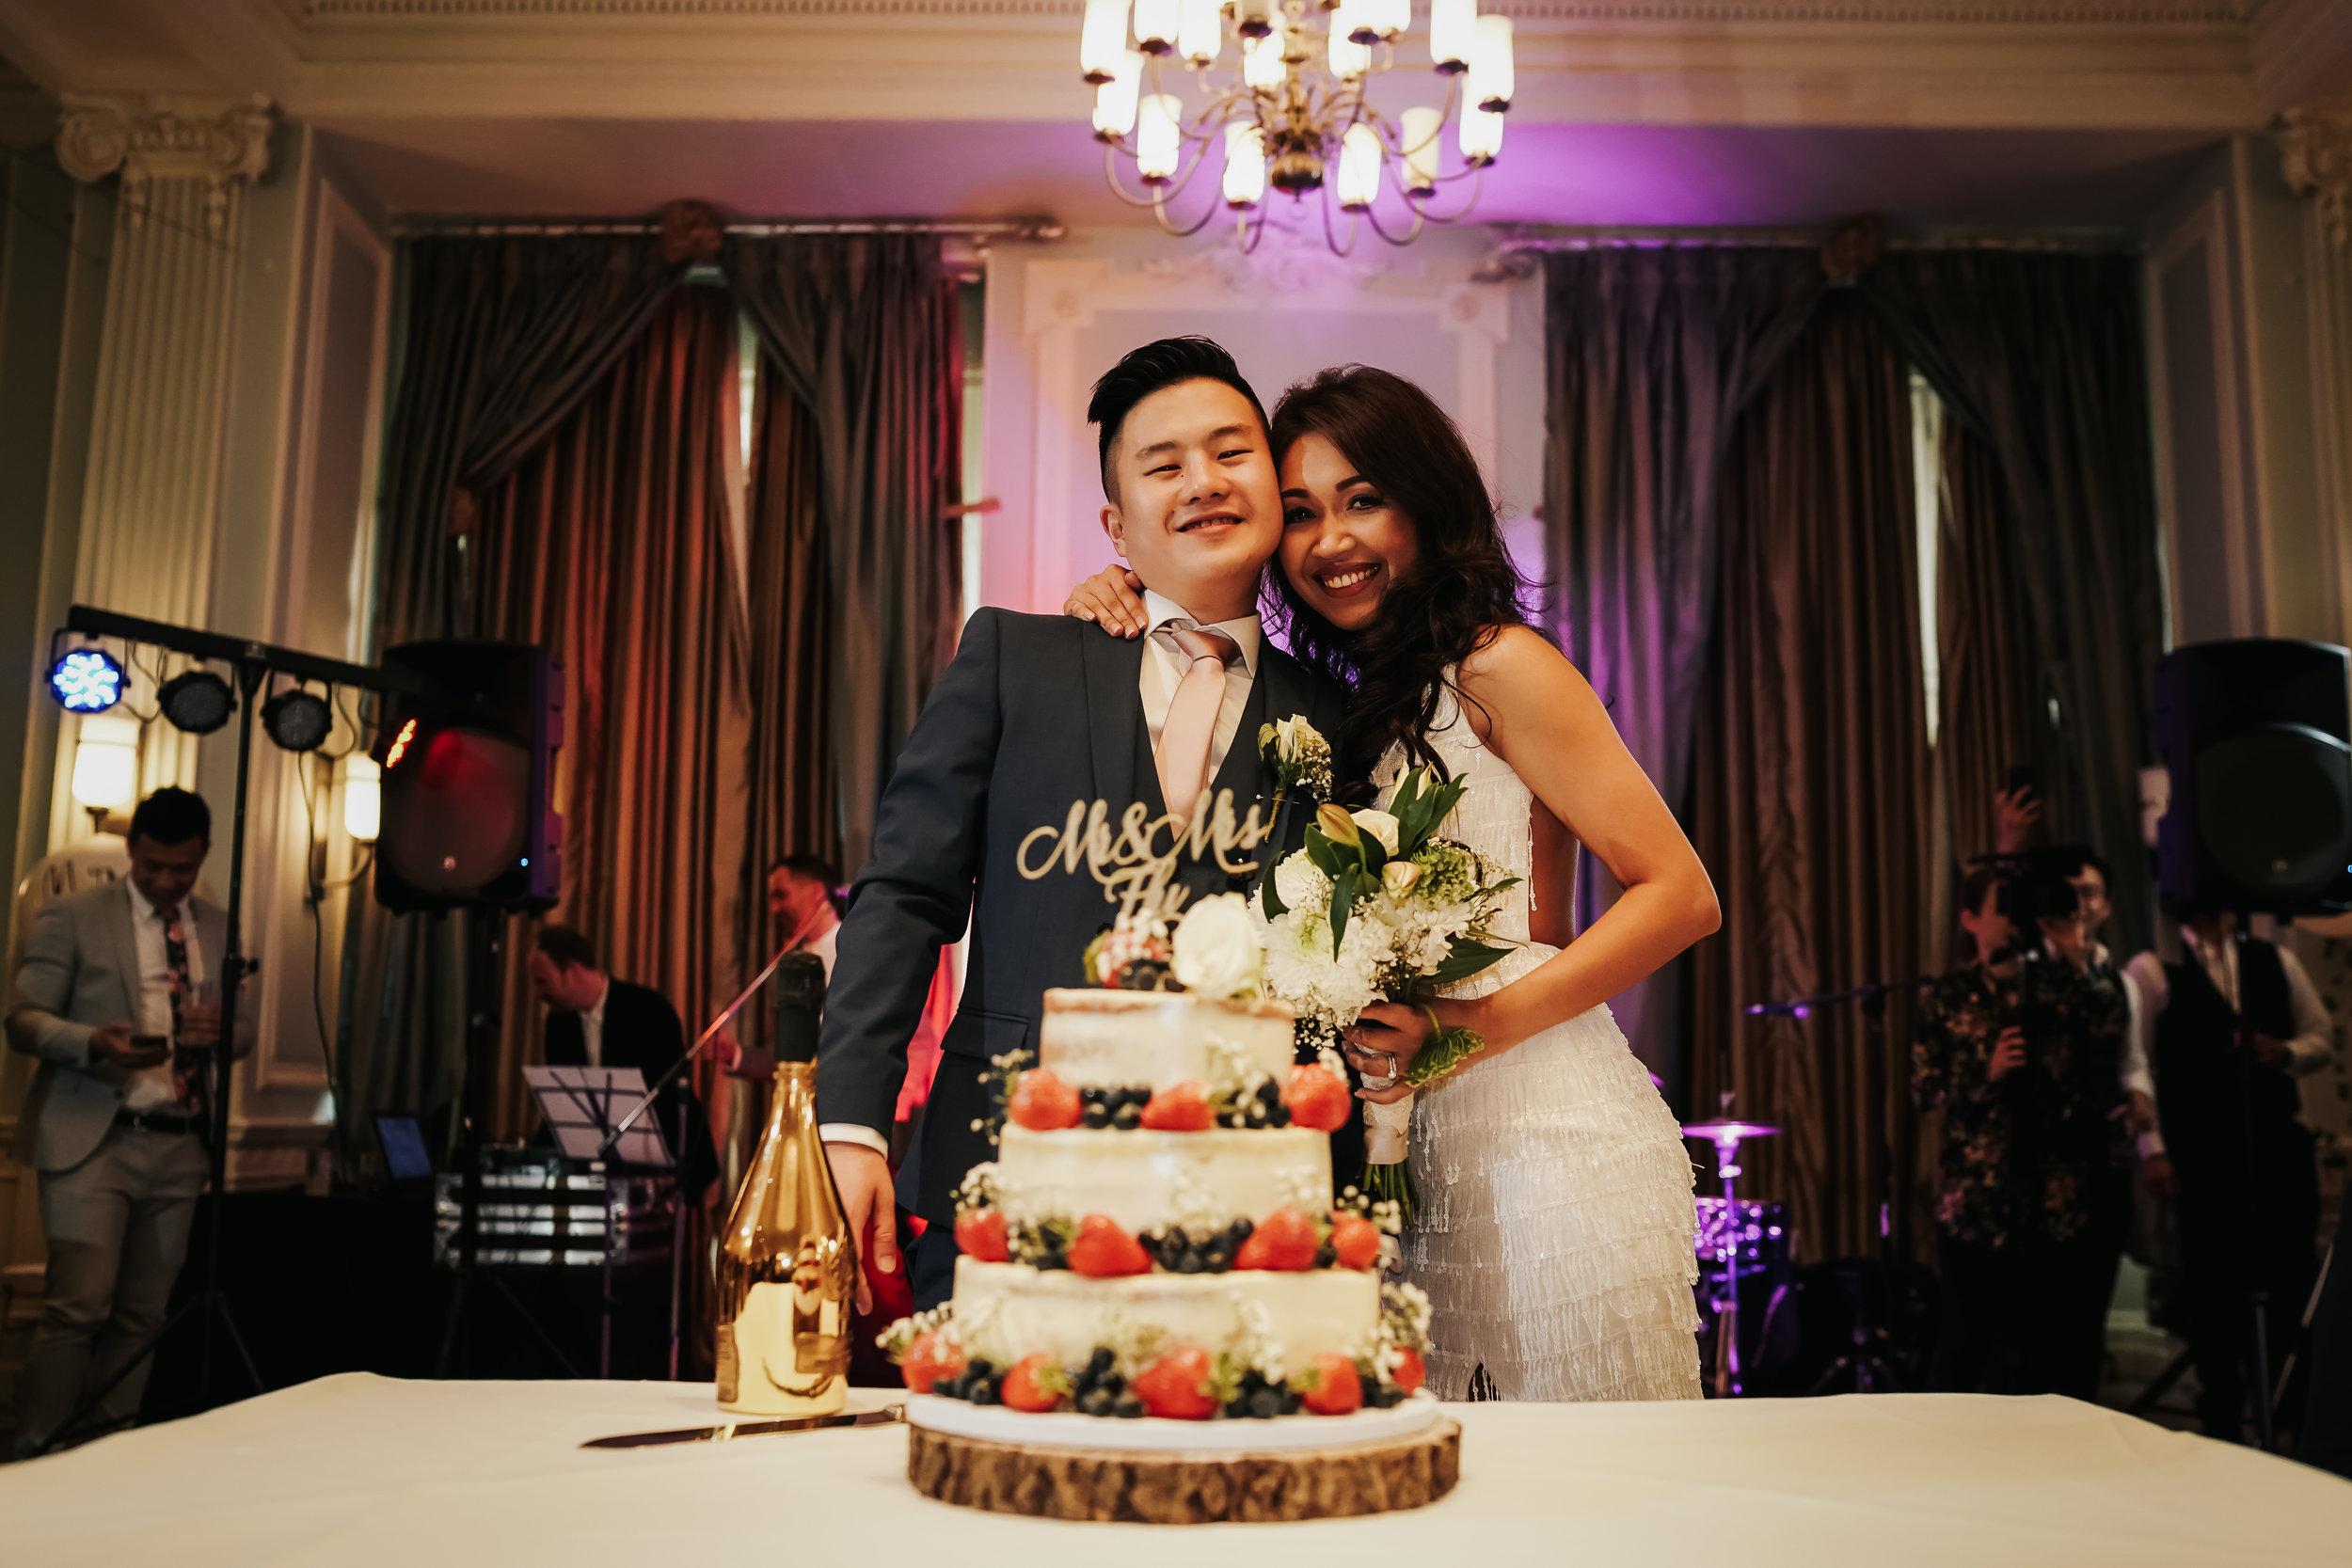 Chinese Wedding Photography Manchester wedding photographer Cheshire - 050.jpg